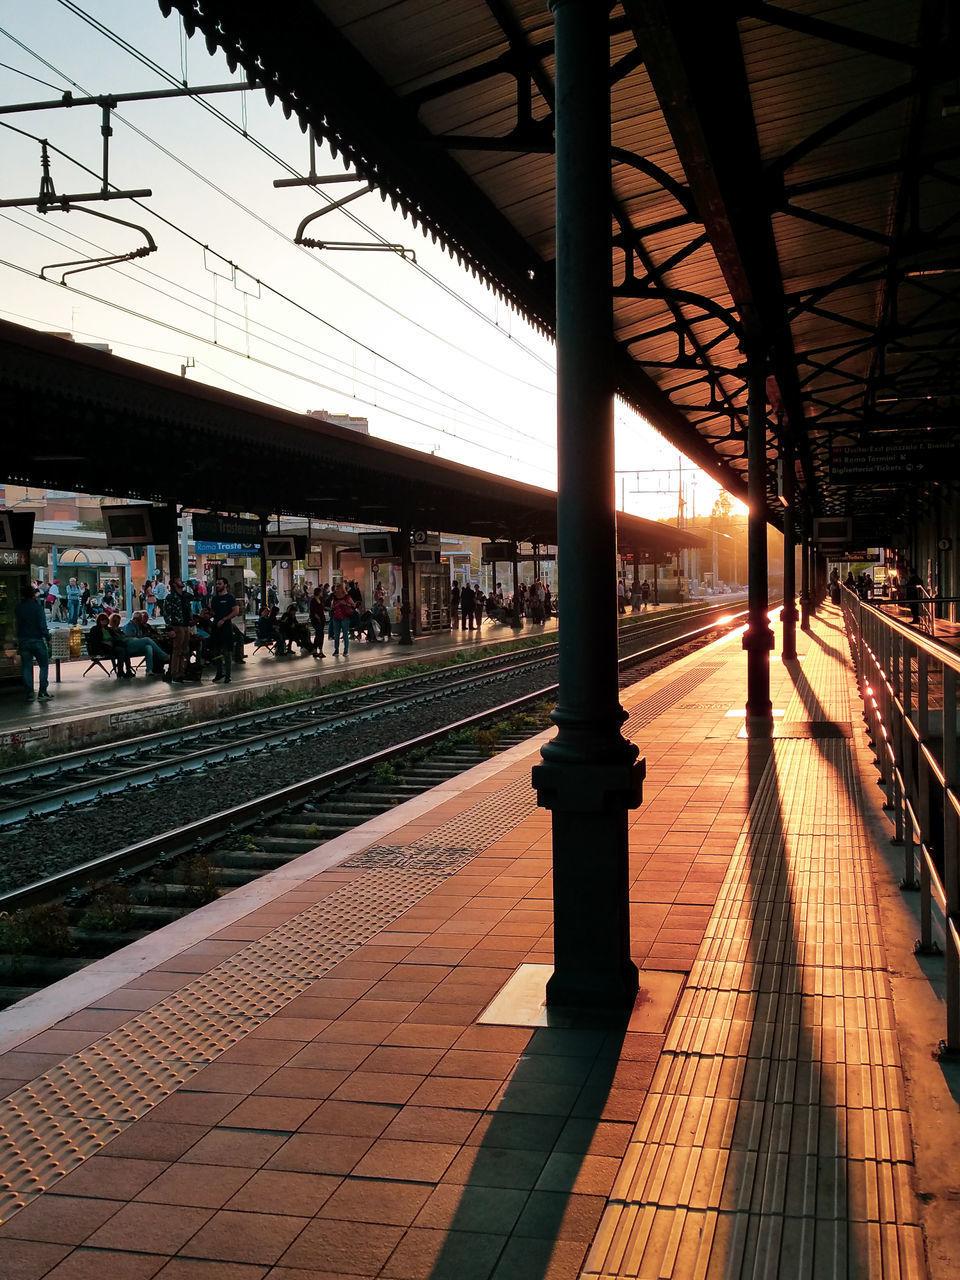 RAILROAD STATION PLATFORM SEEN THROUGH TRAIN AT RAILWAY